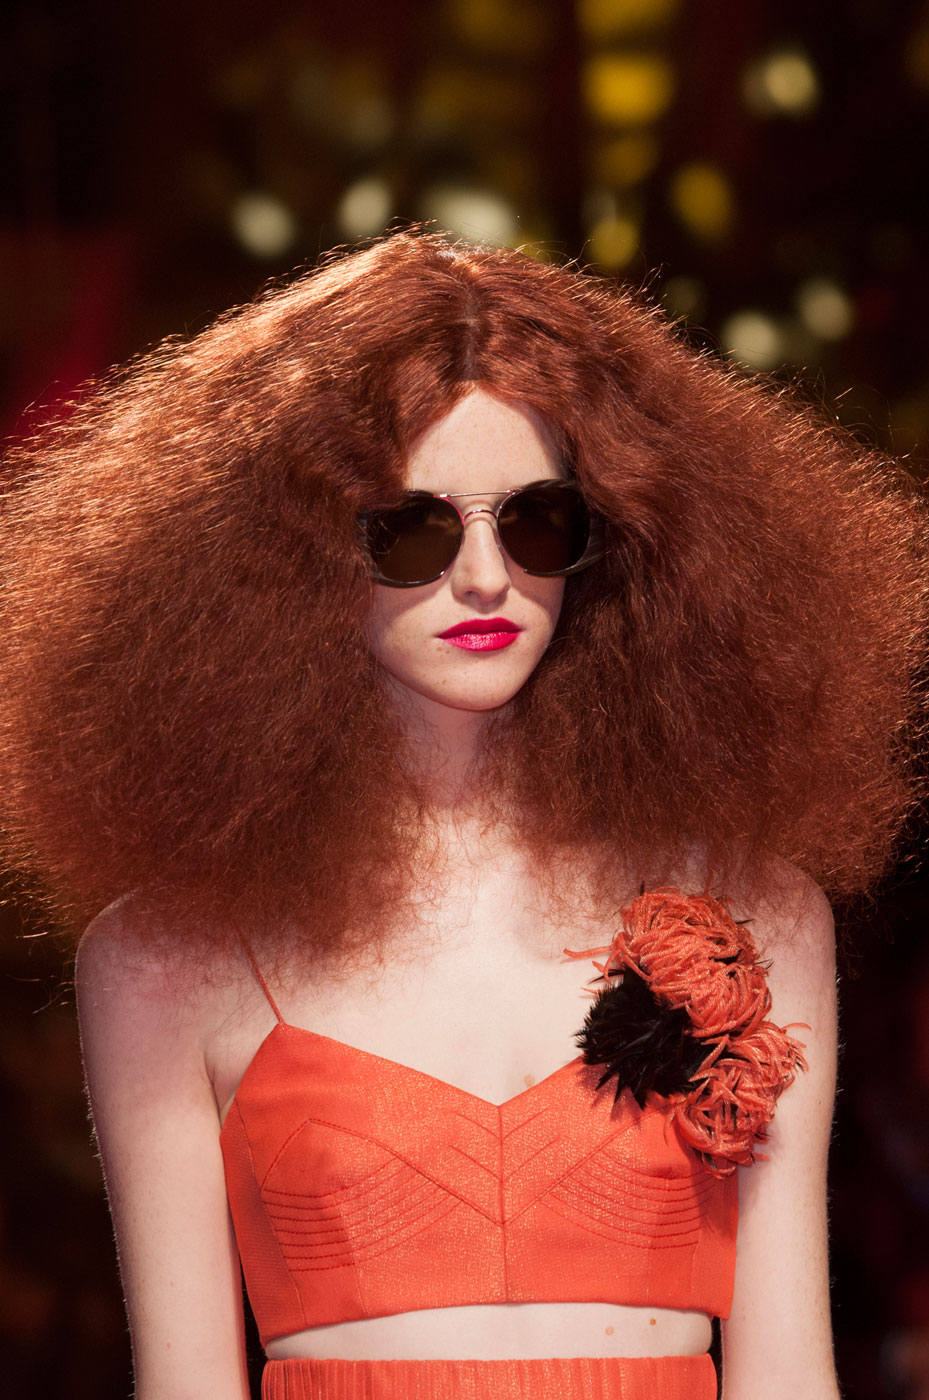 Schiaparelli-fashion-runway-show-close-ups-haute-couture-paris-spring-summer-2015-the-impression-24